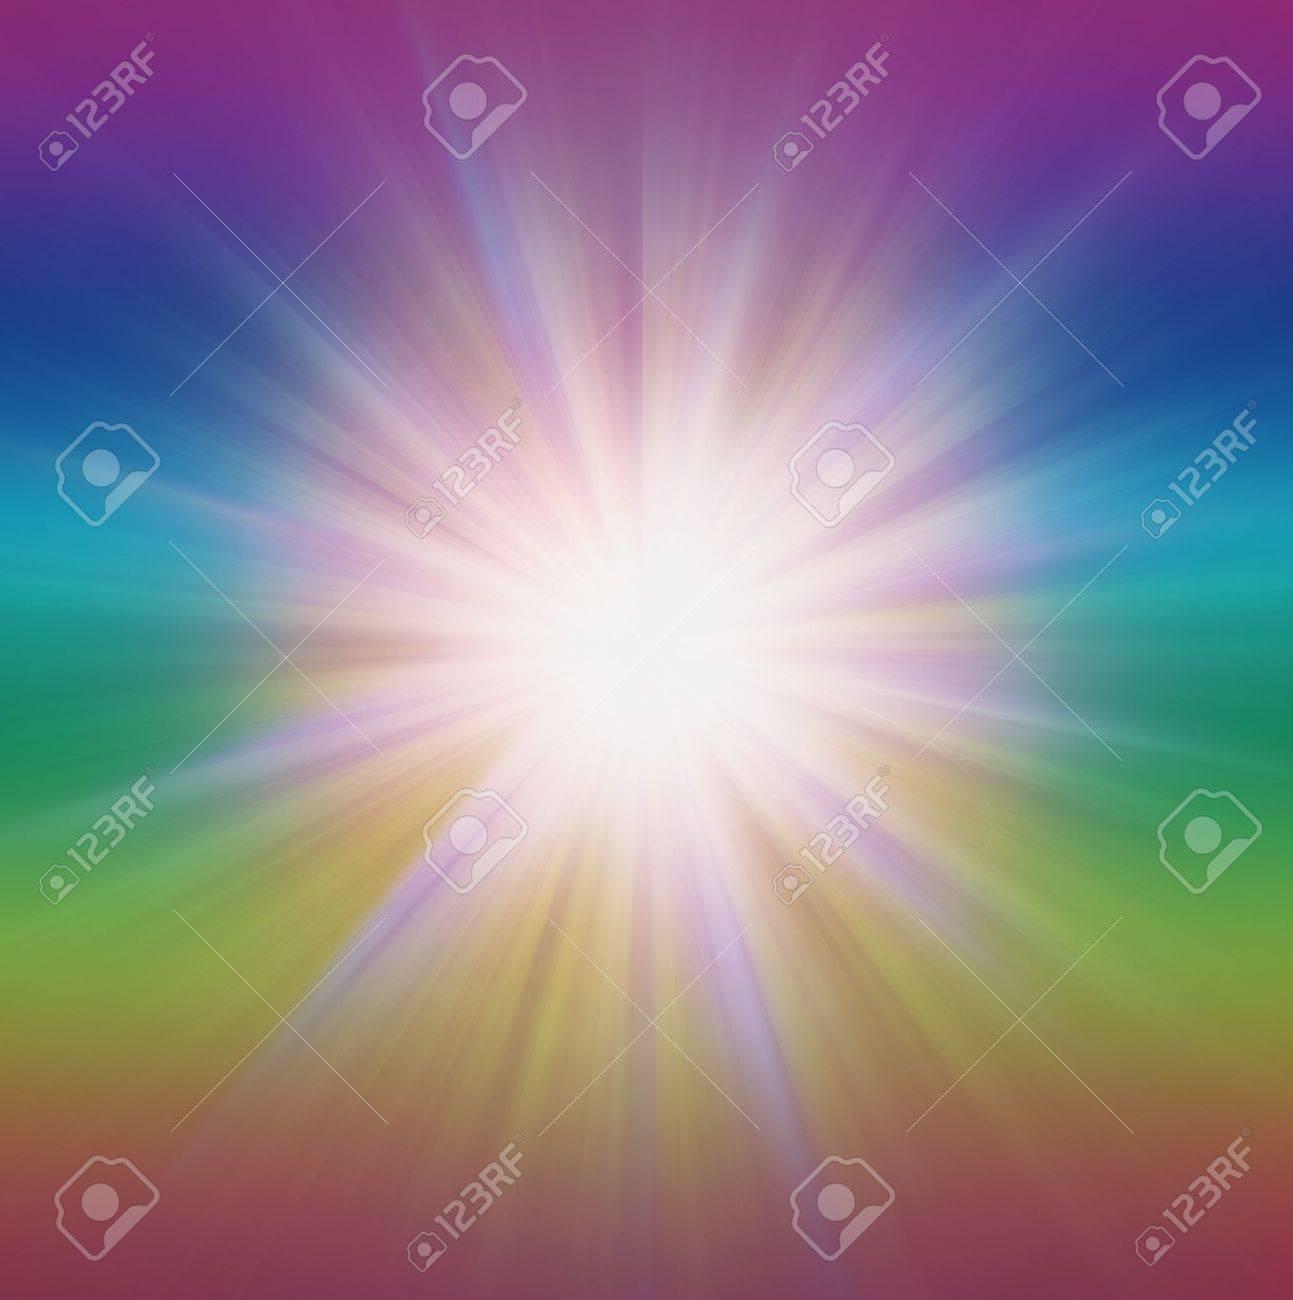 Radial zoom burst of energy, abstract background illustration Stock Illustration - 14803687